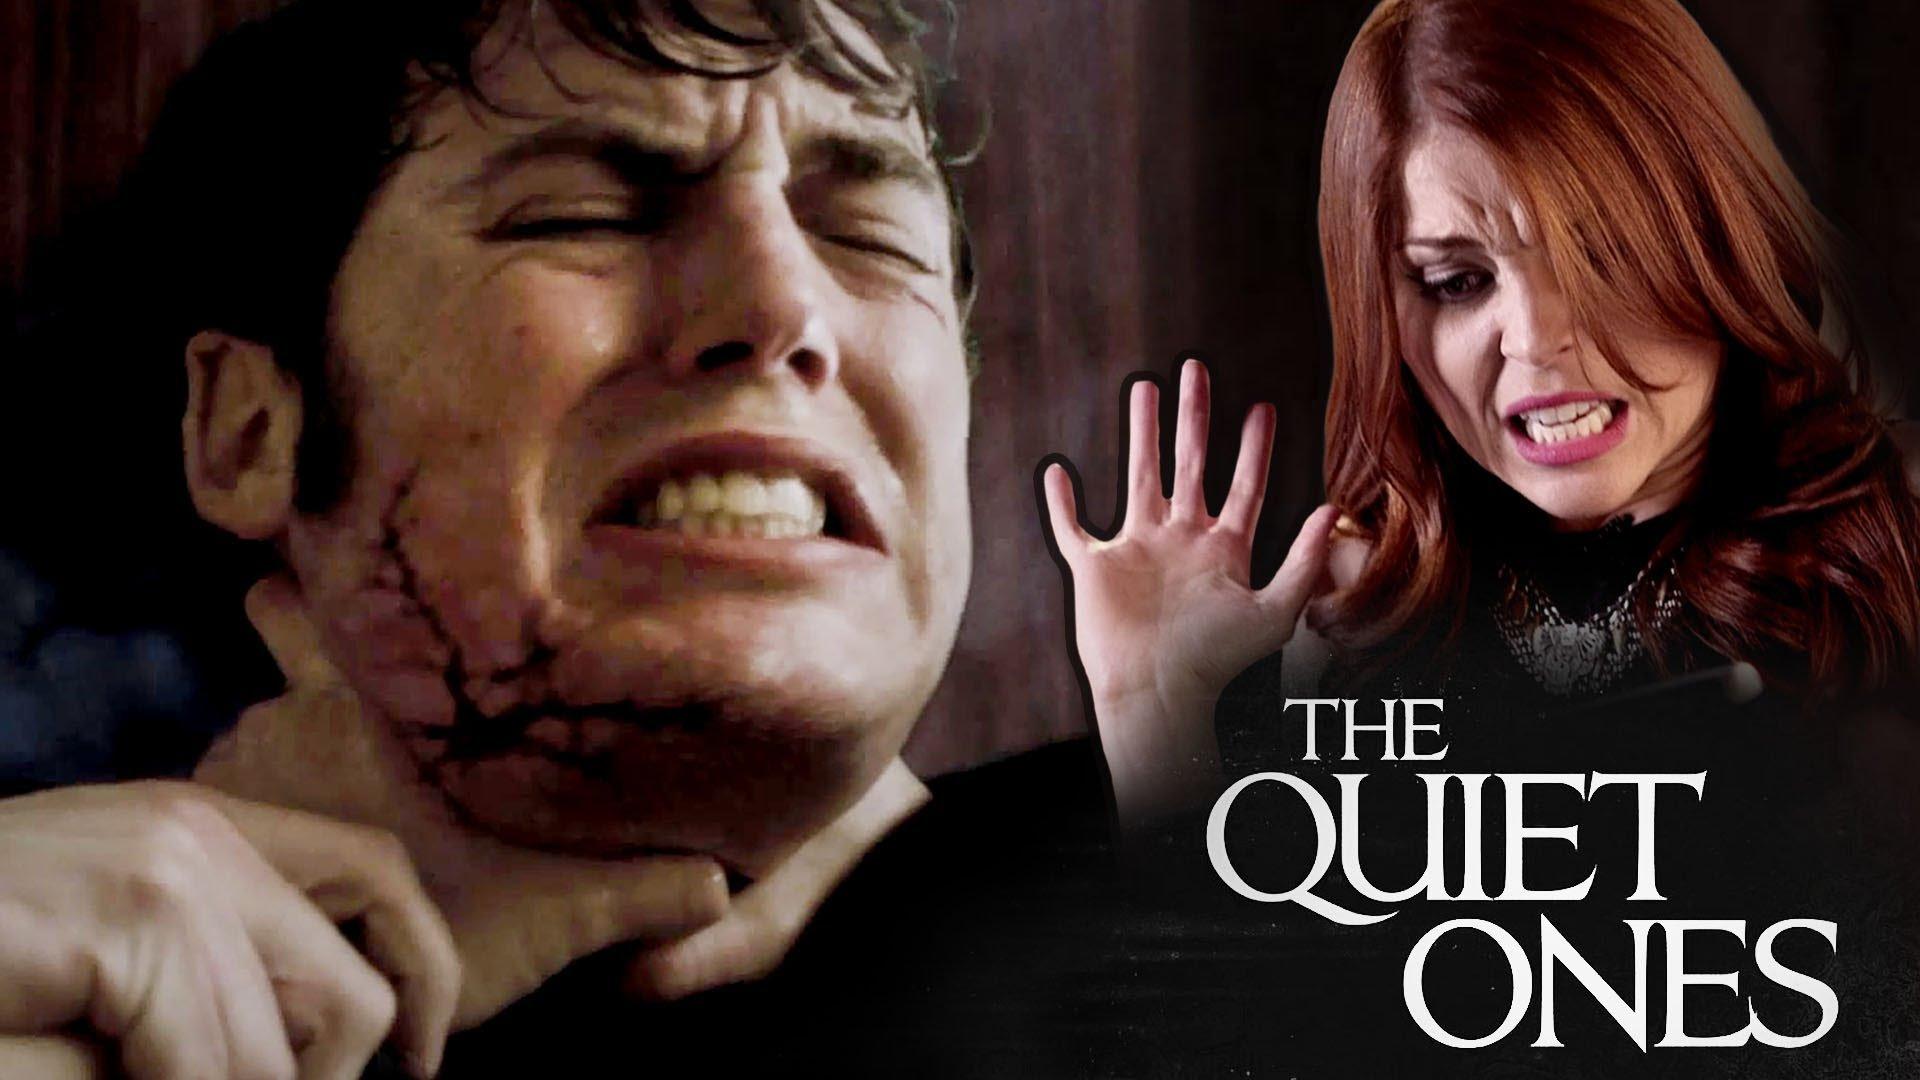 THE QUIET ONES horror dark Quiet Ones Movie Poster